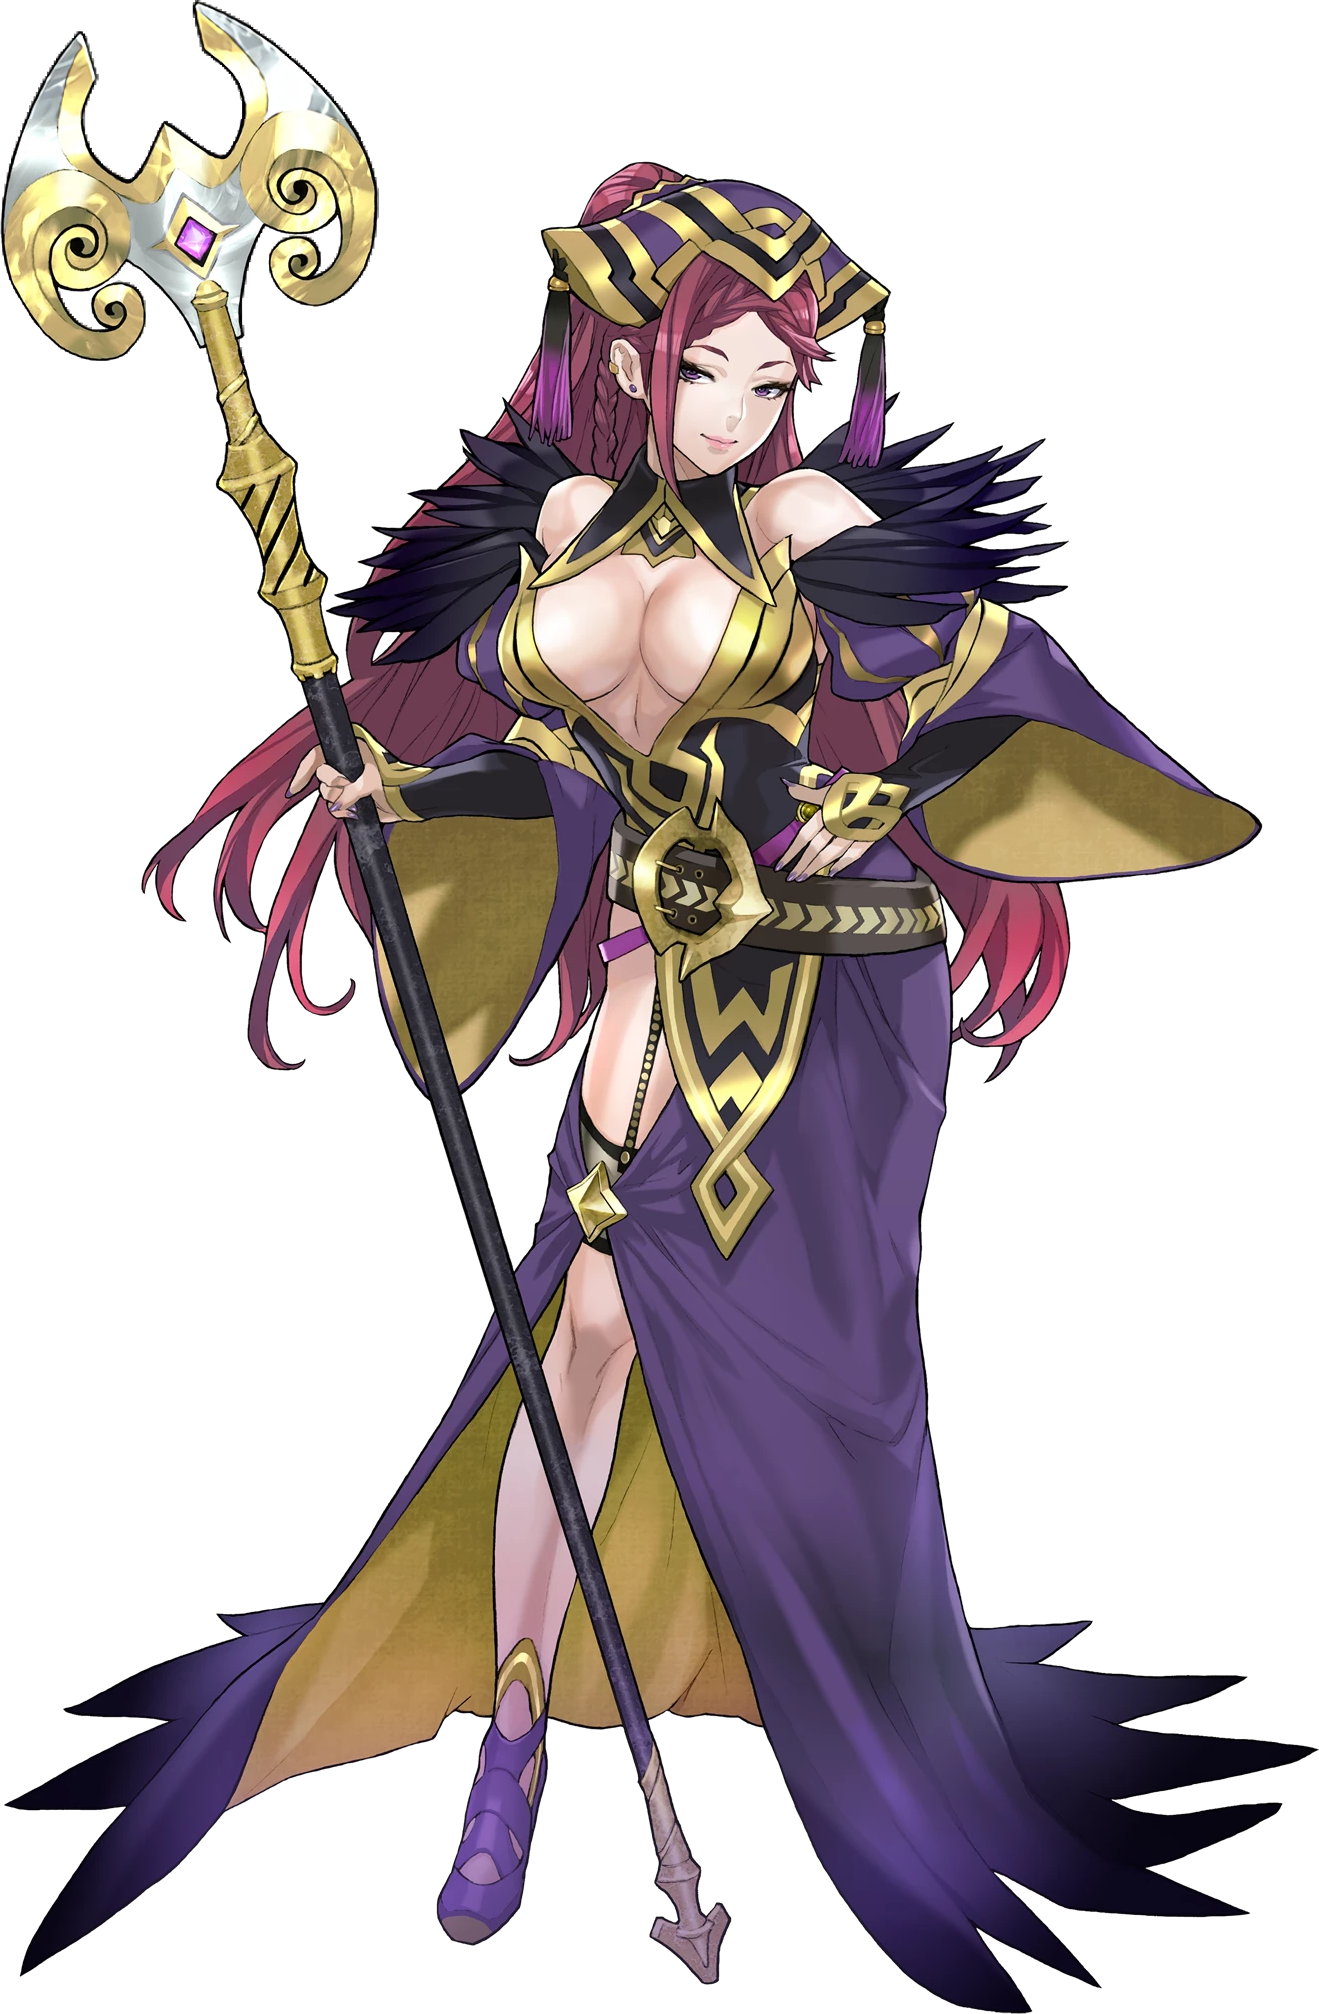 Lilina rule 34